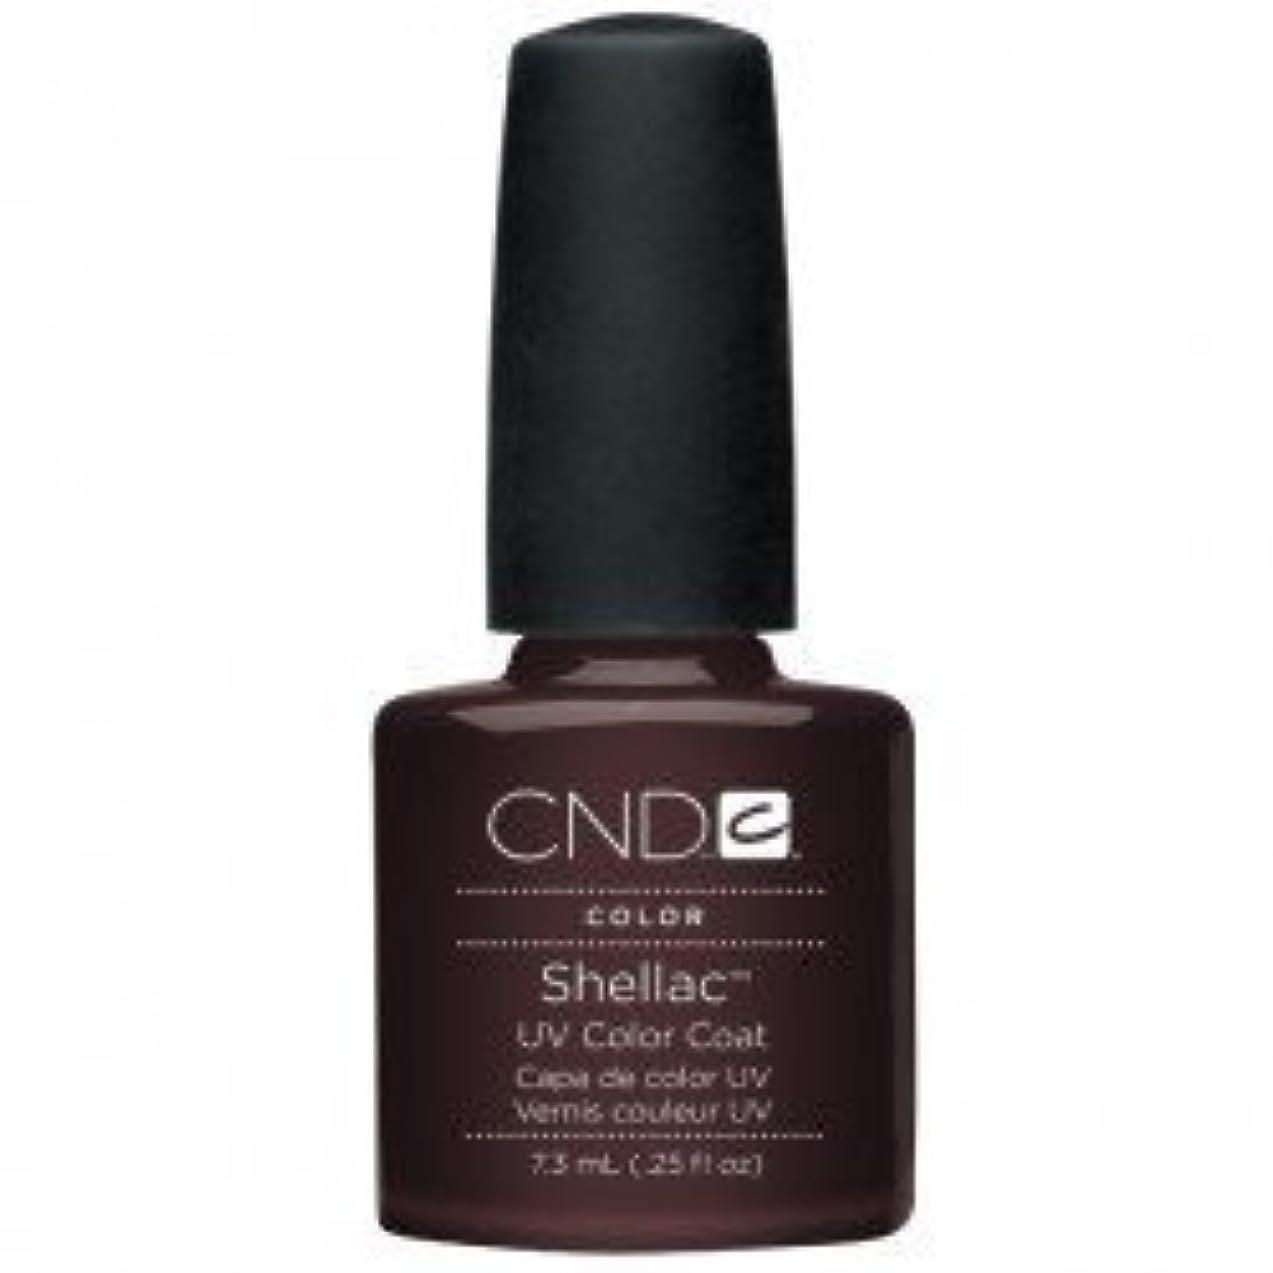 New CND Creative Shellac UV3 Nail Power Polish - Fedora 7.3ml by CND Creative Nail Designs